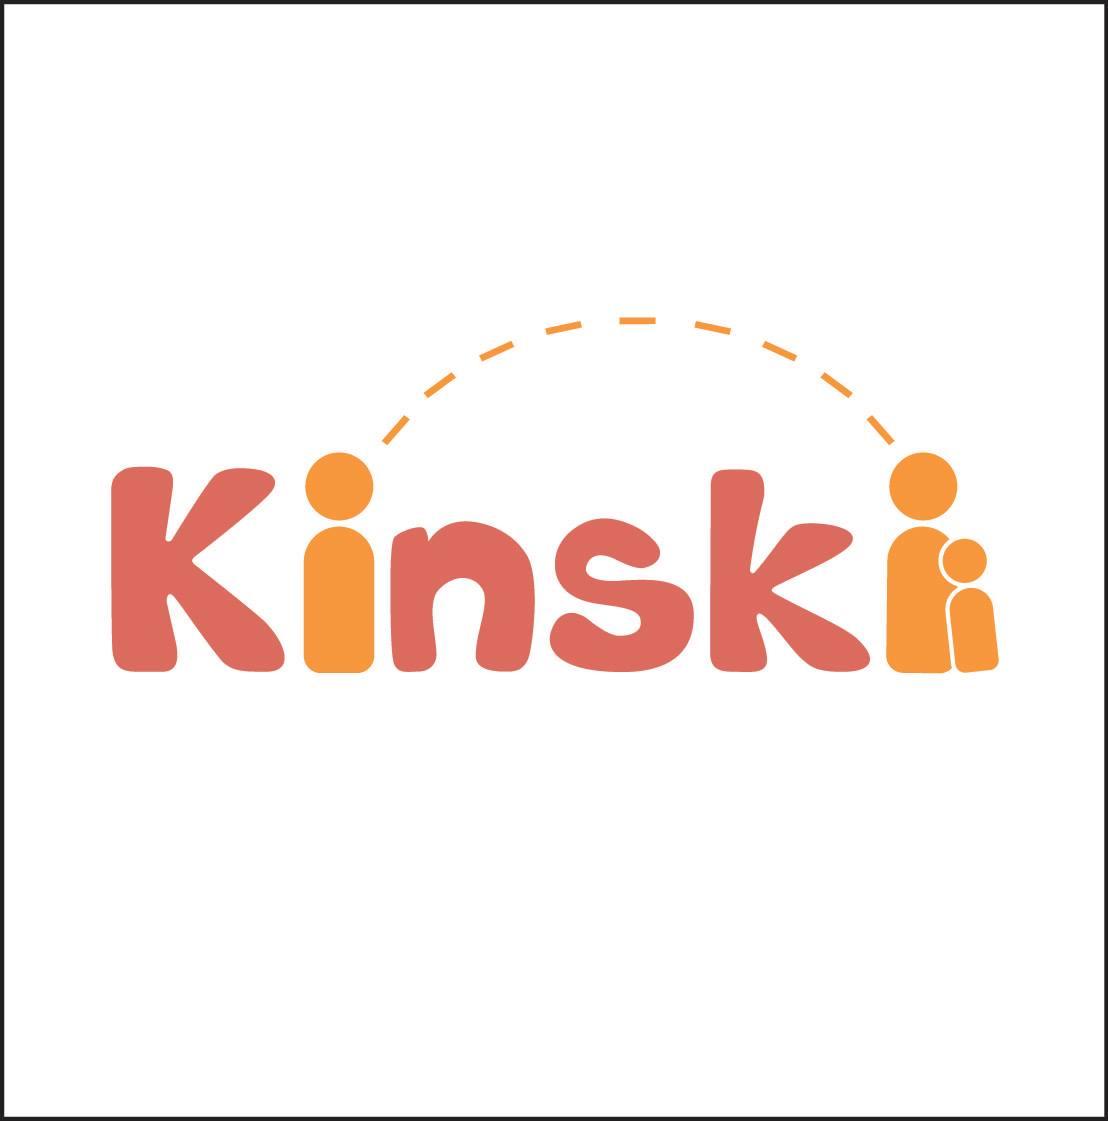 Kinskii App Art and Development